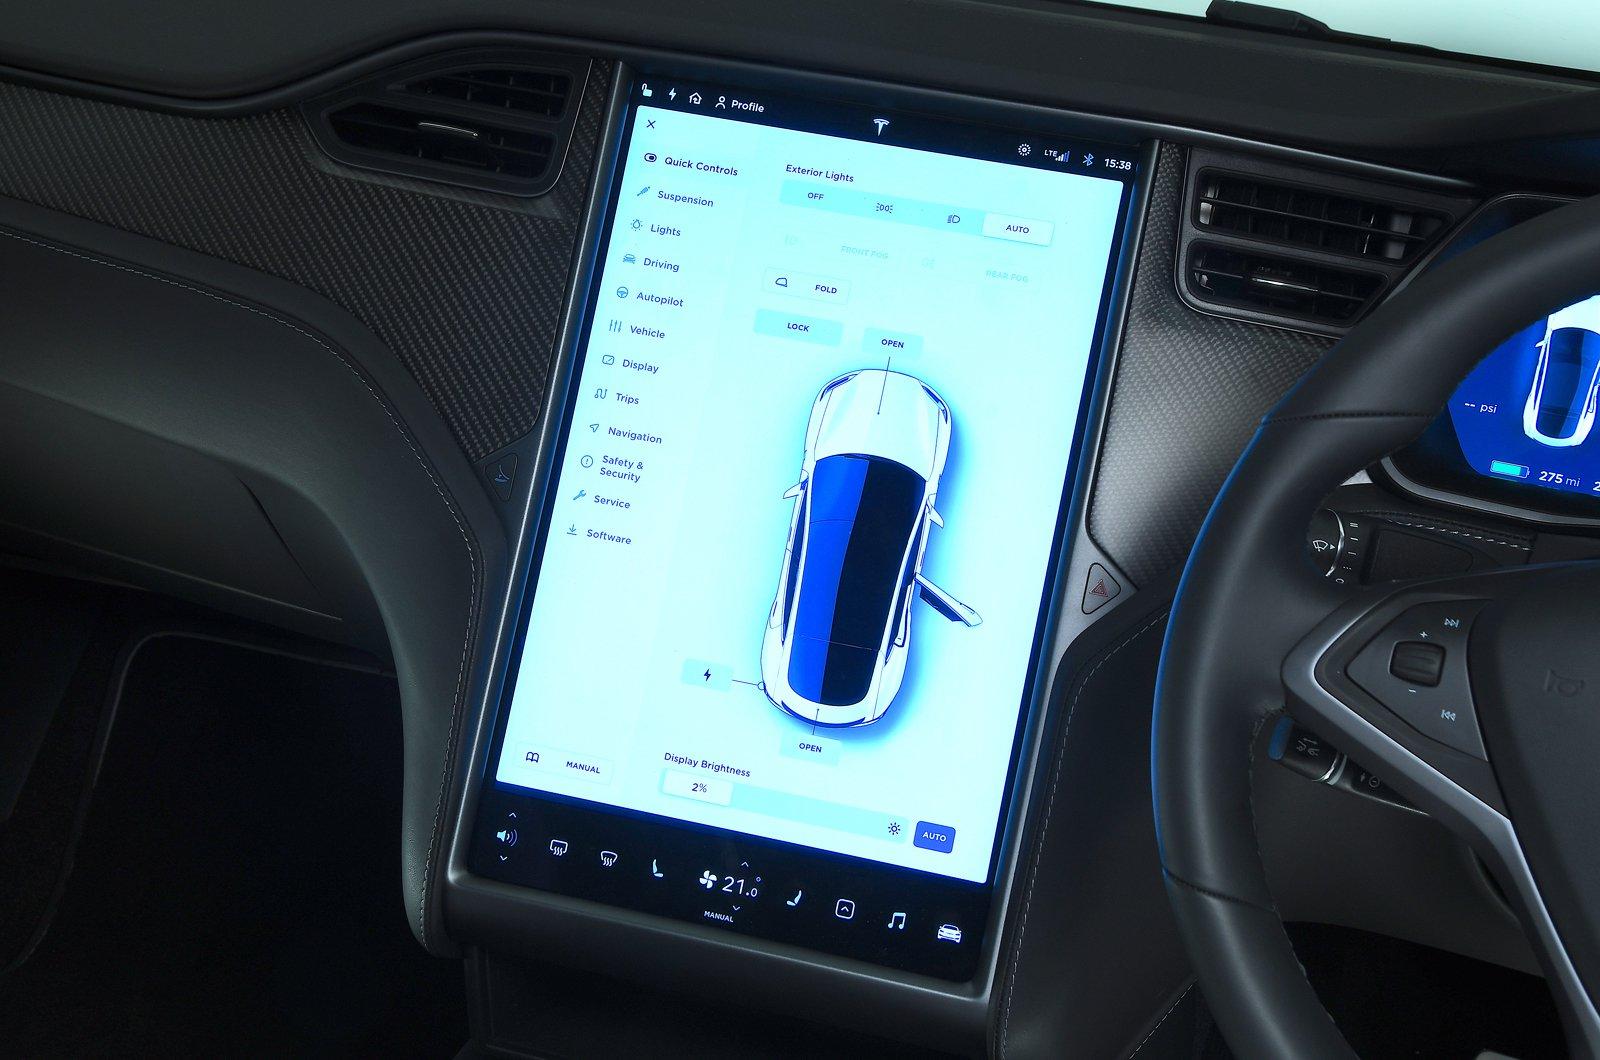 2020 Tesla Model S touchscreen